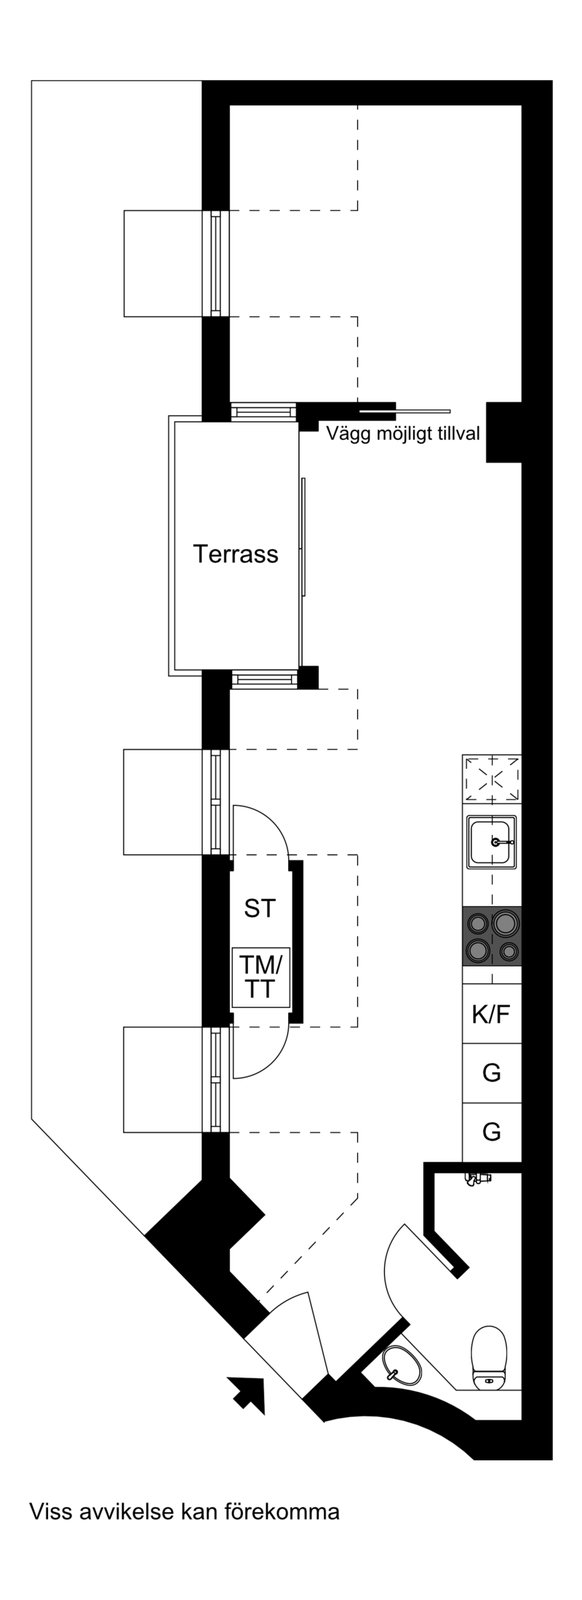 Pipersgatan 6A, 4 tr